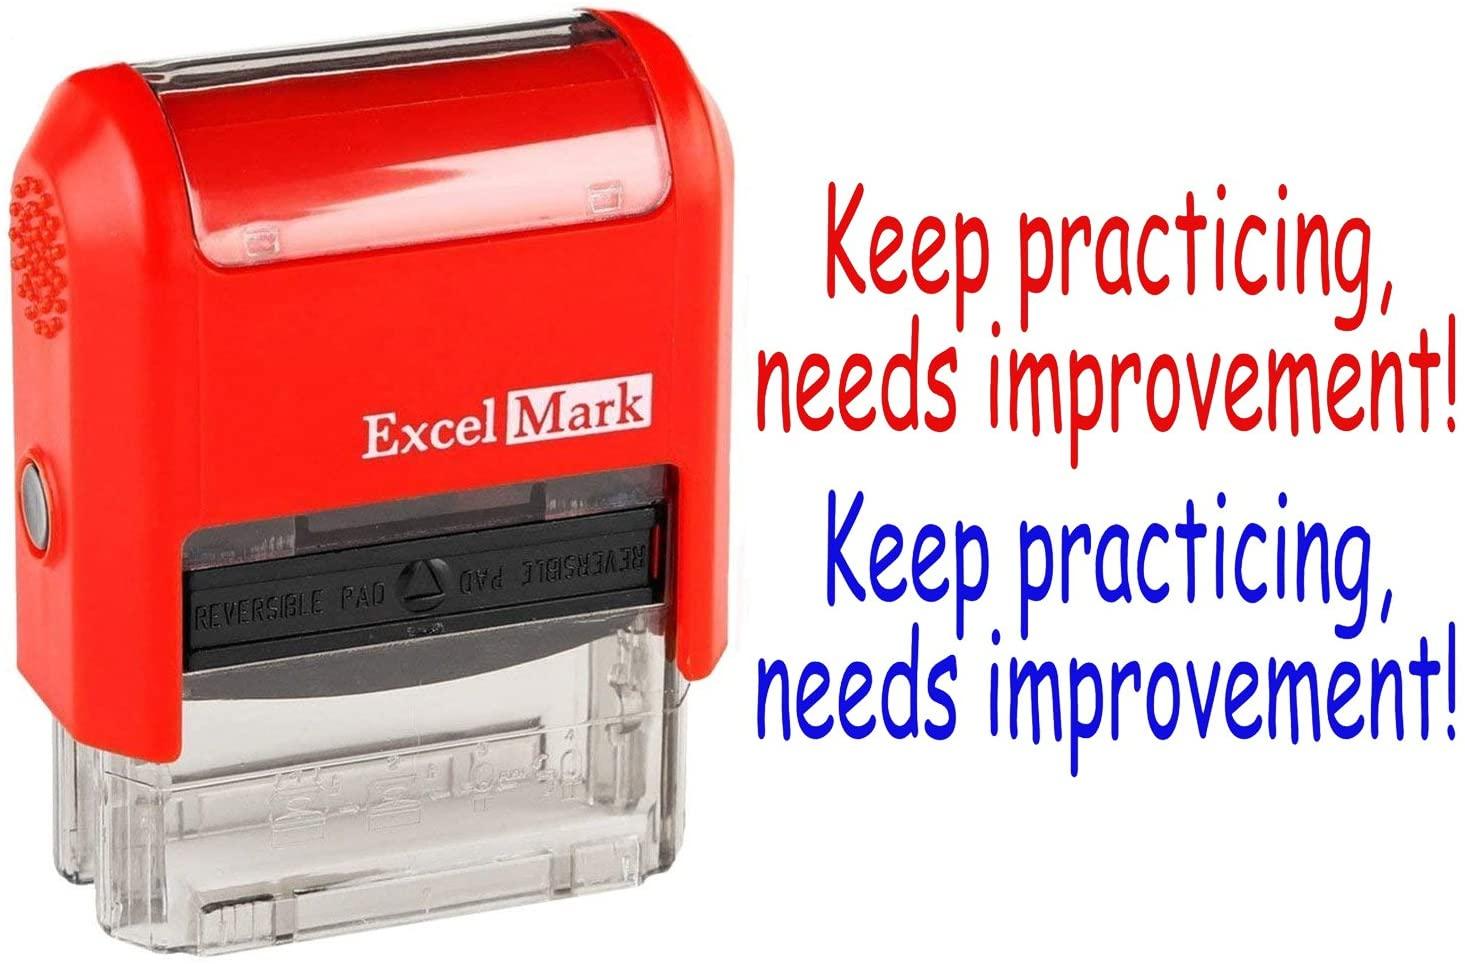 ExcelMark Self-Inking Rubber Teacher Stamp Keep Practicing, Needs Improvement!